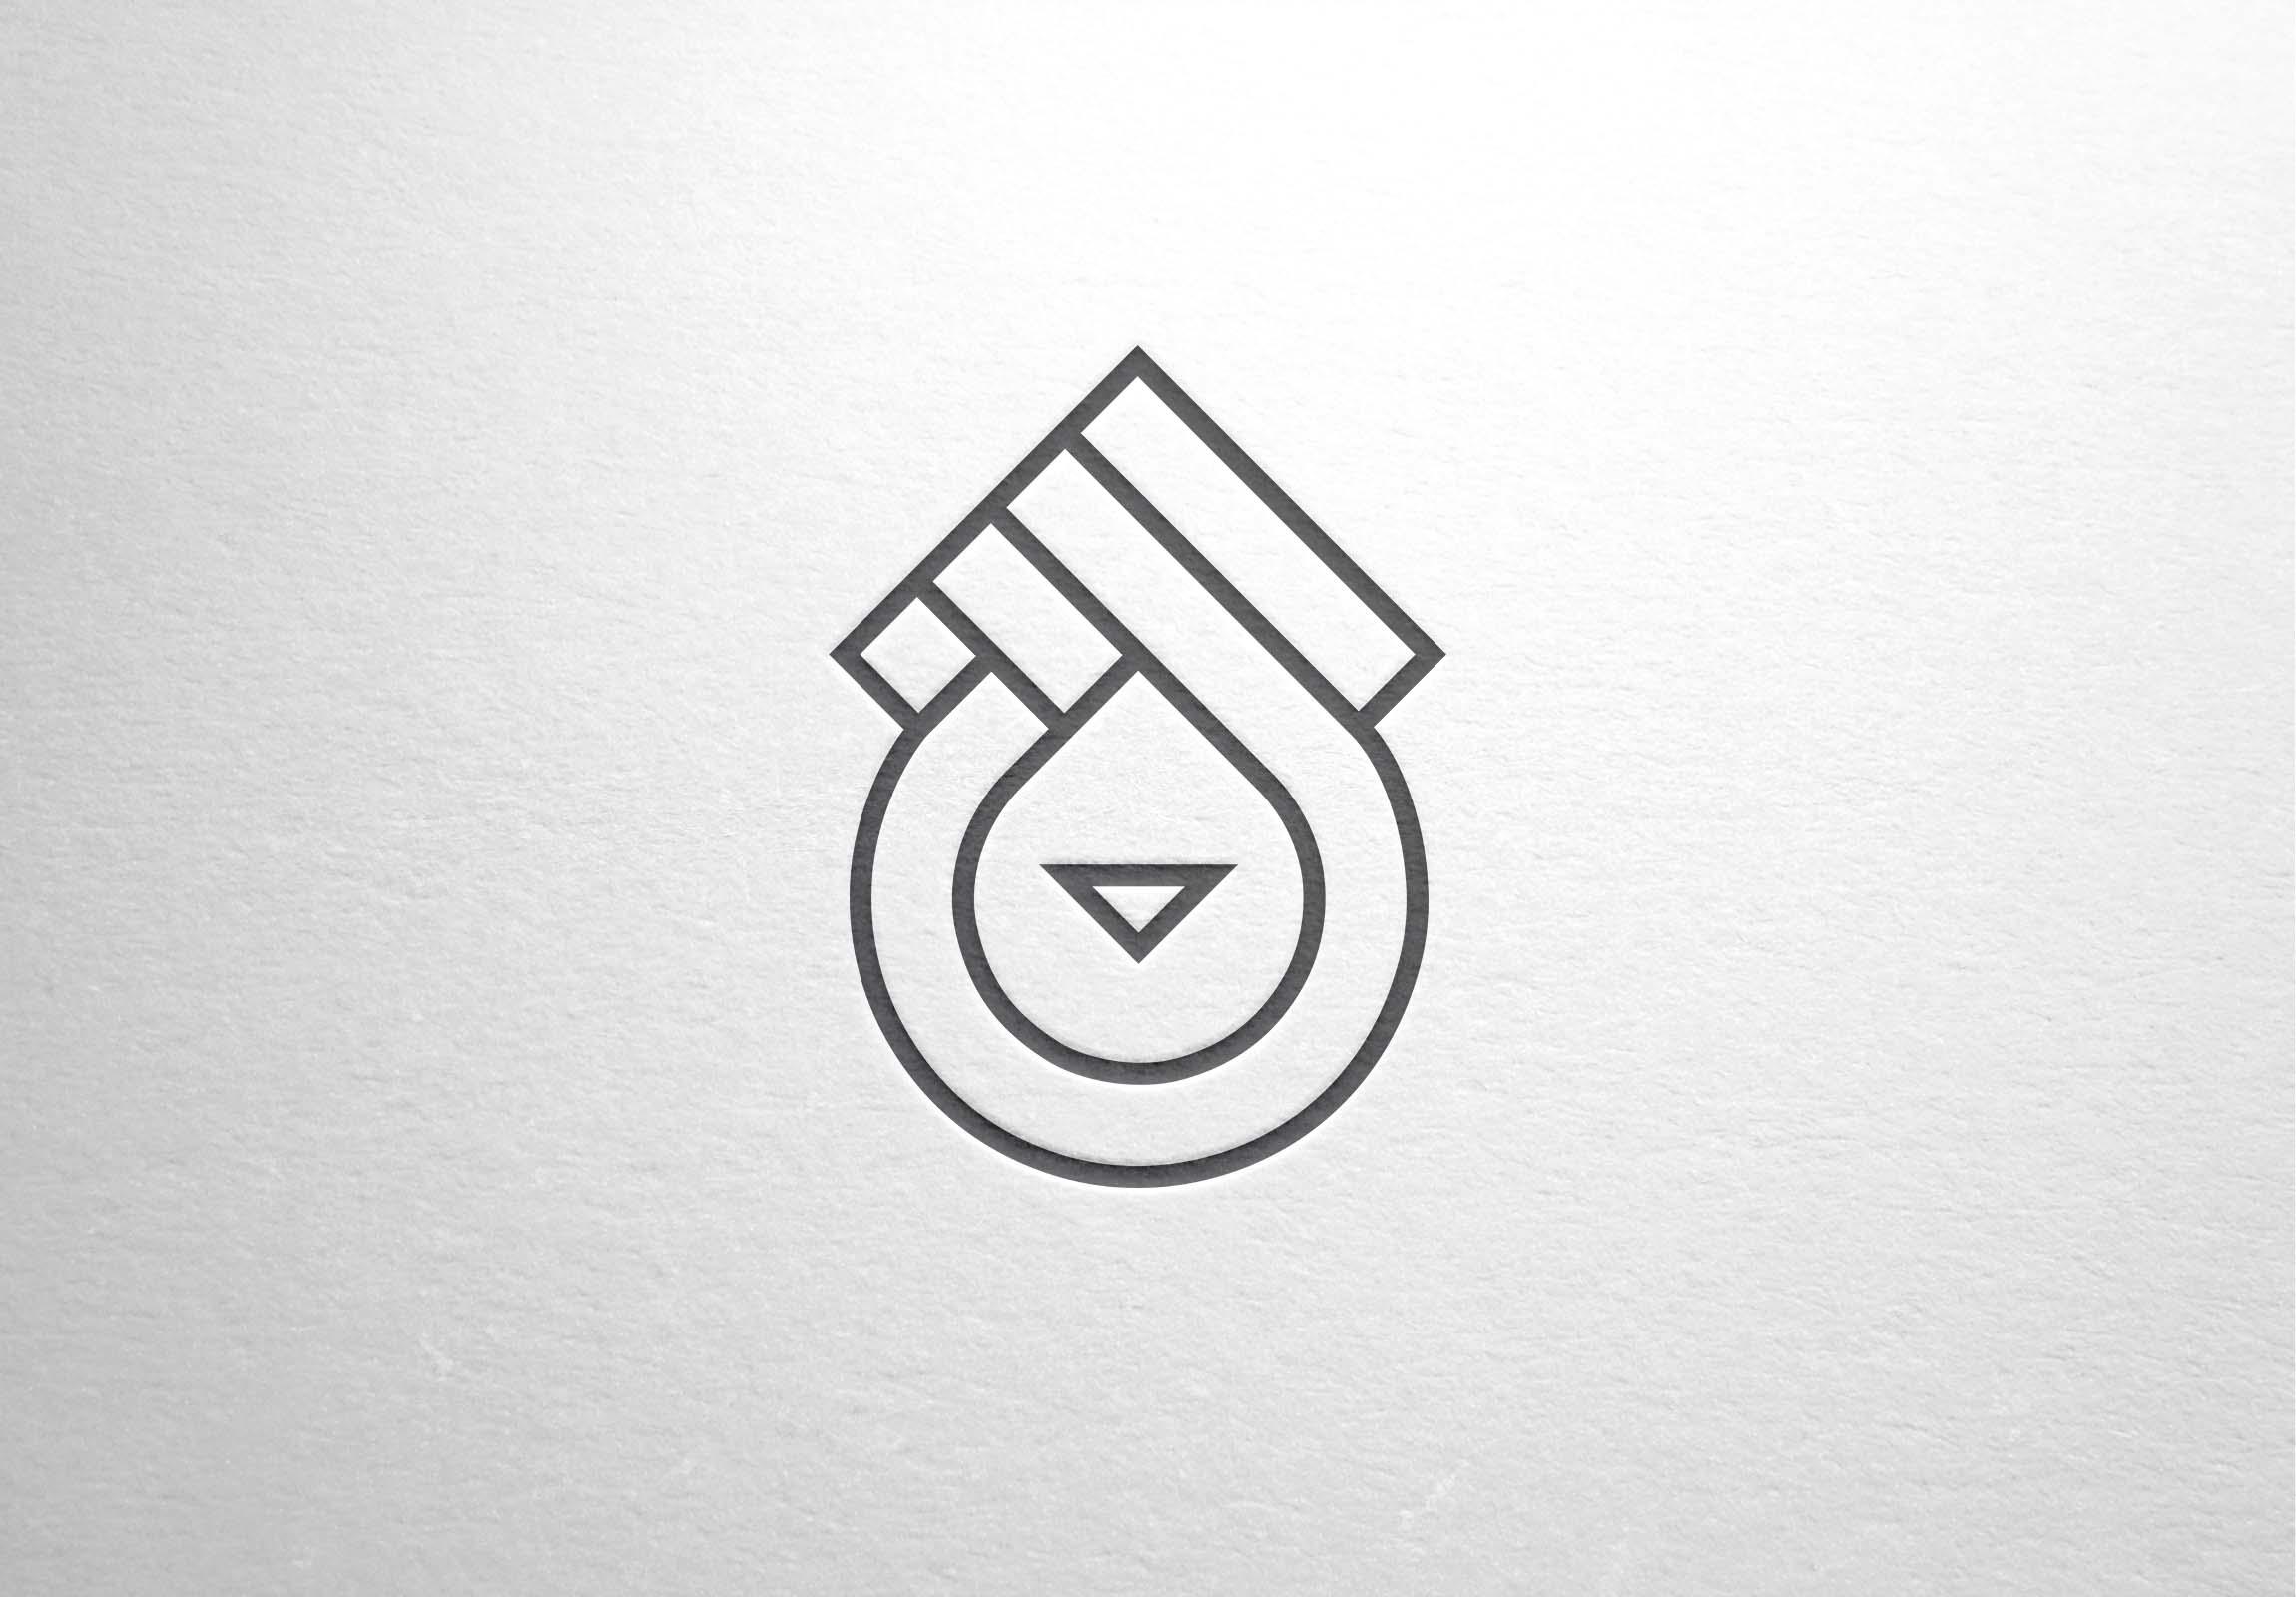 Разработать логотип, визитку, фирменный бланк. фото f_68158f8c7e3a45dd.jpg